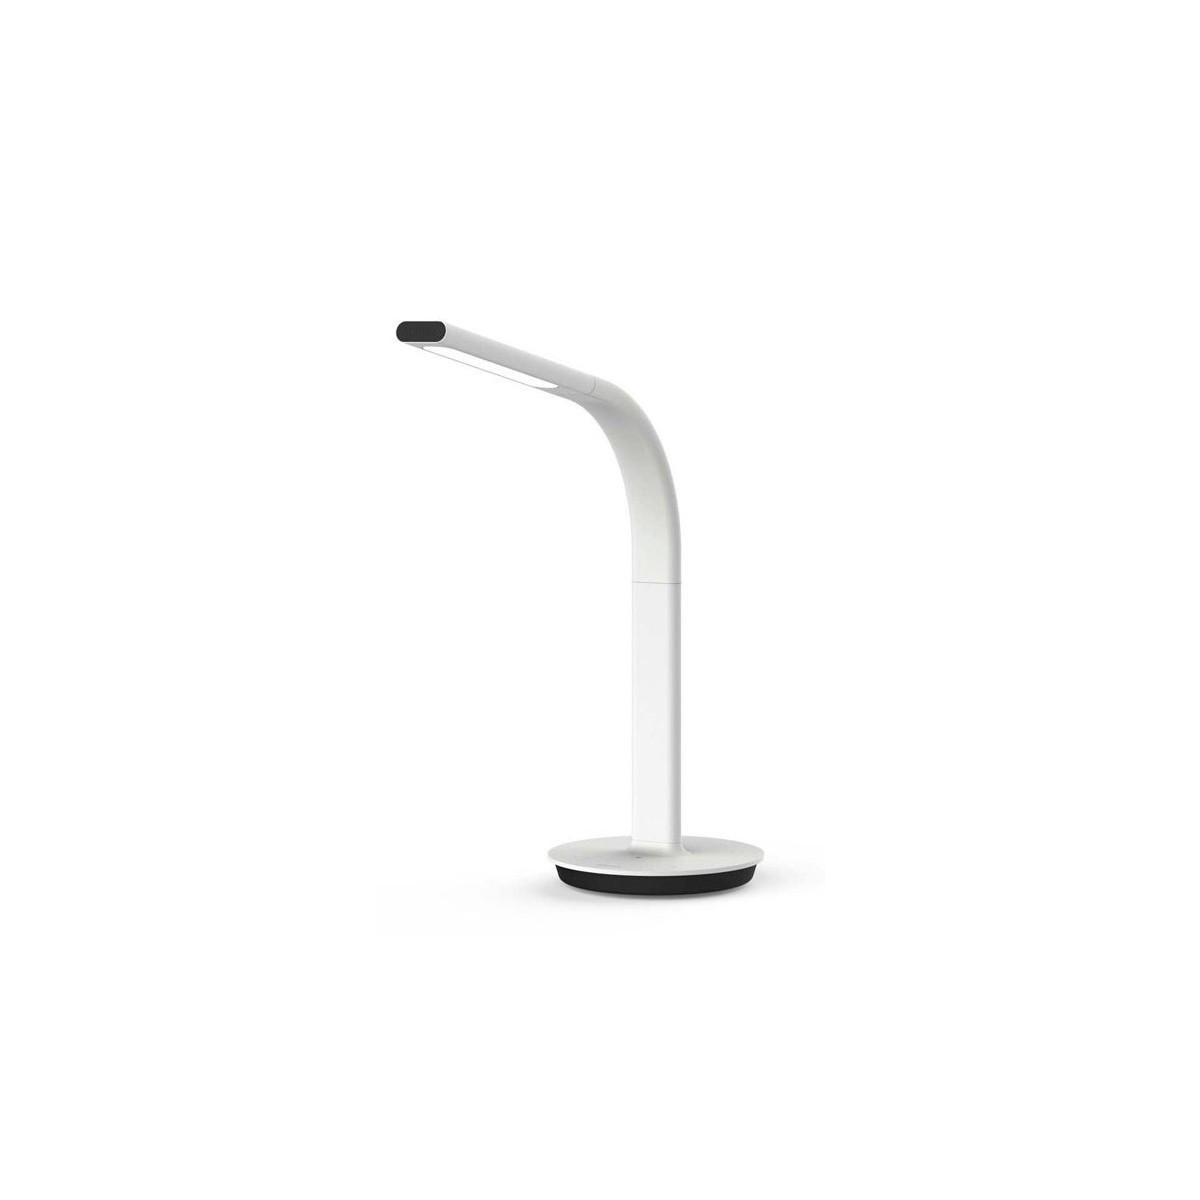 Настольная лампа Xiaomi 10W Eyecare Smart Lamp 2 P27615 (MUE4051RT)